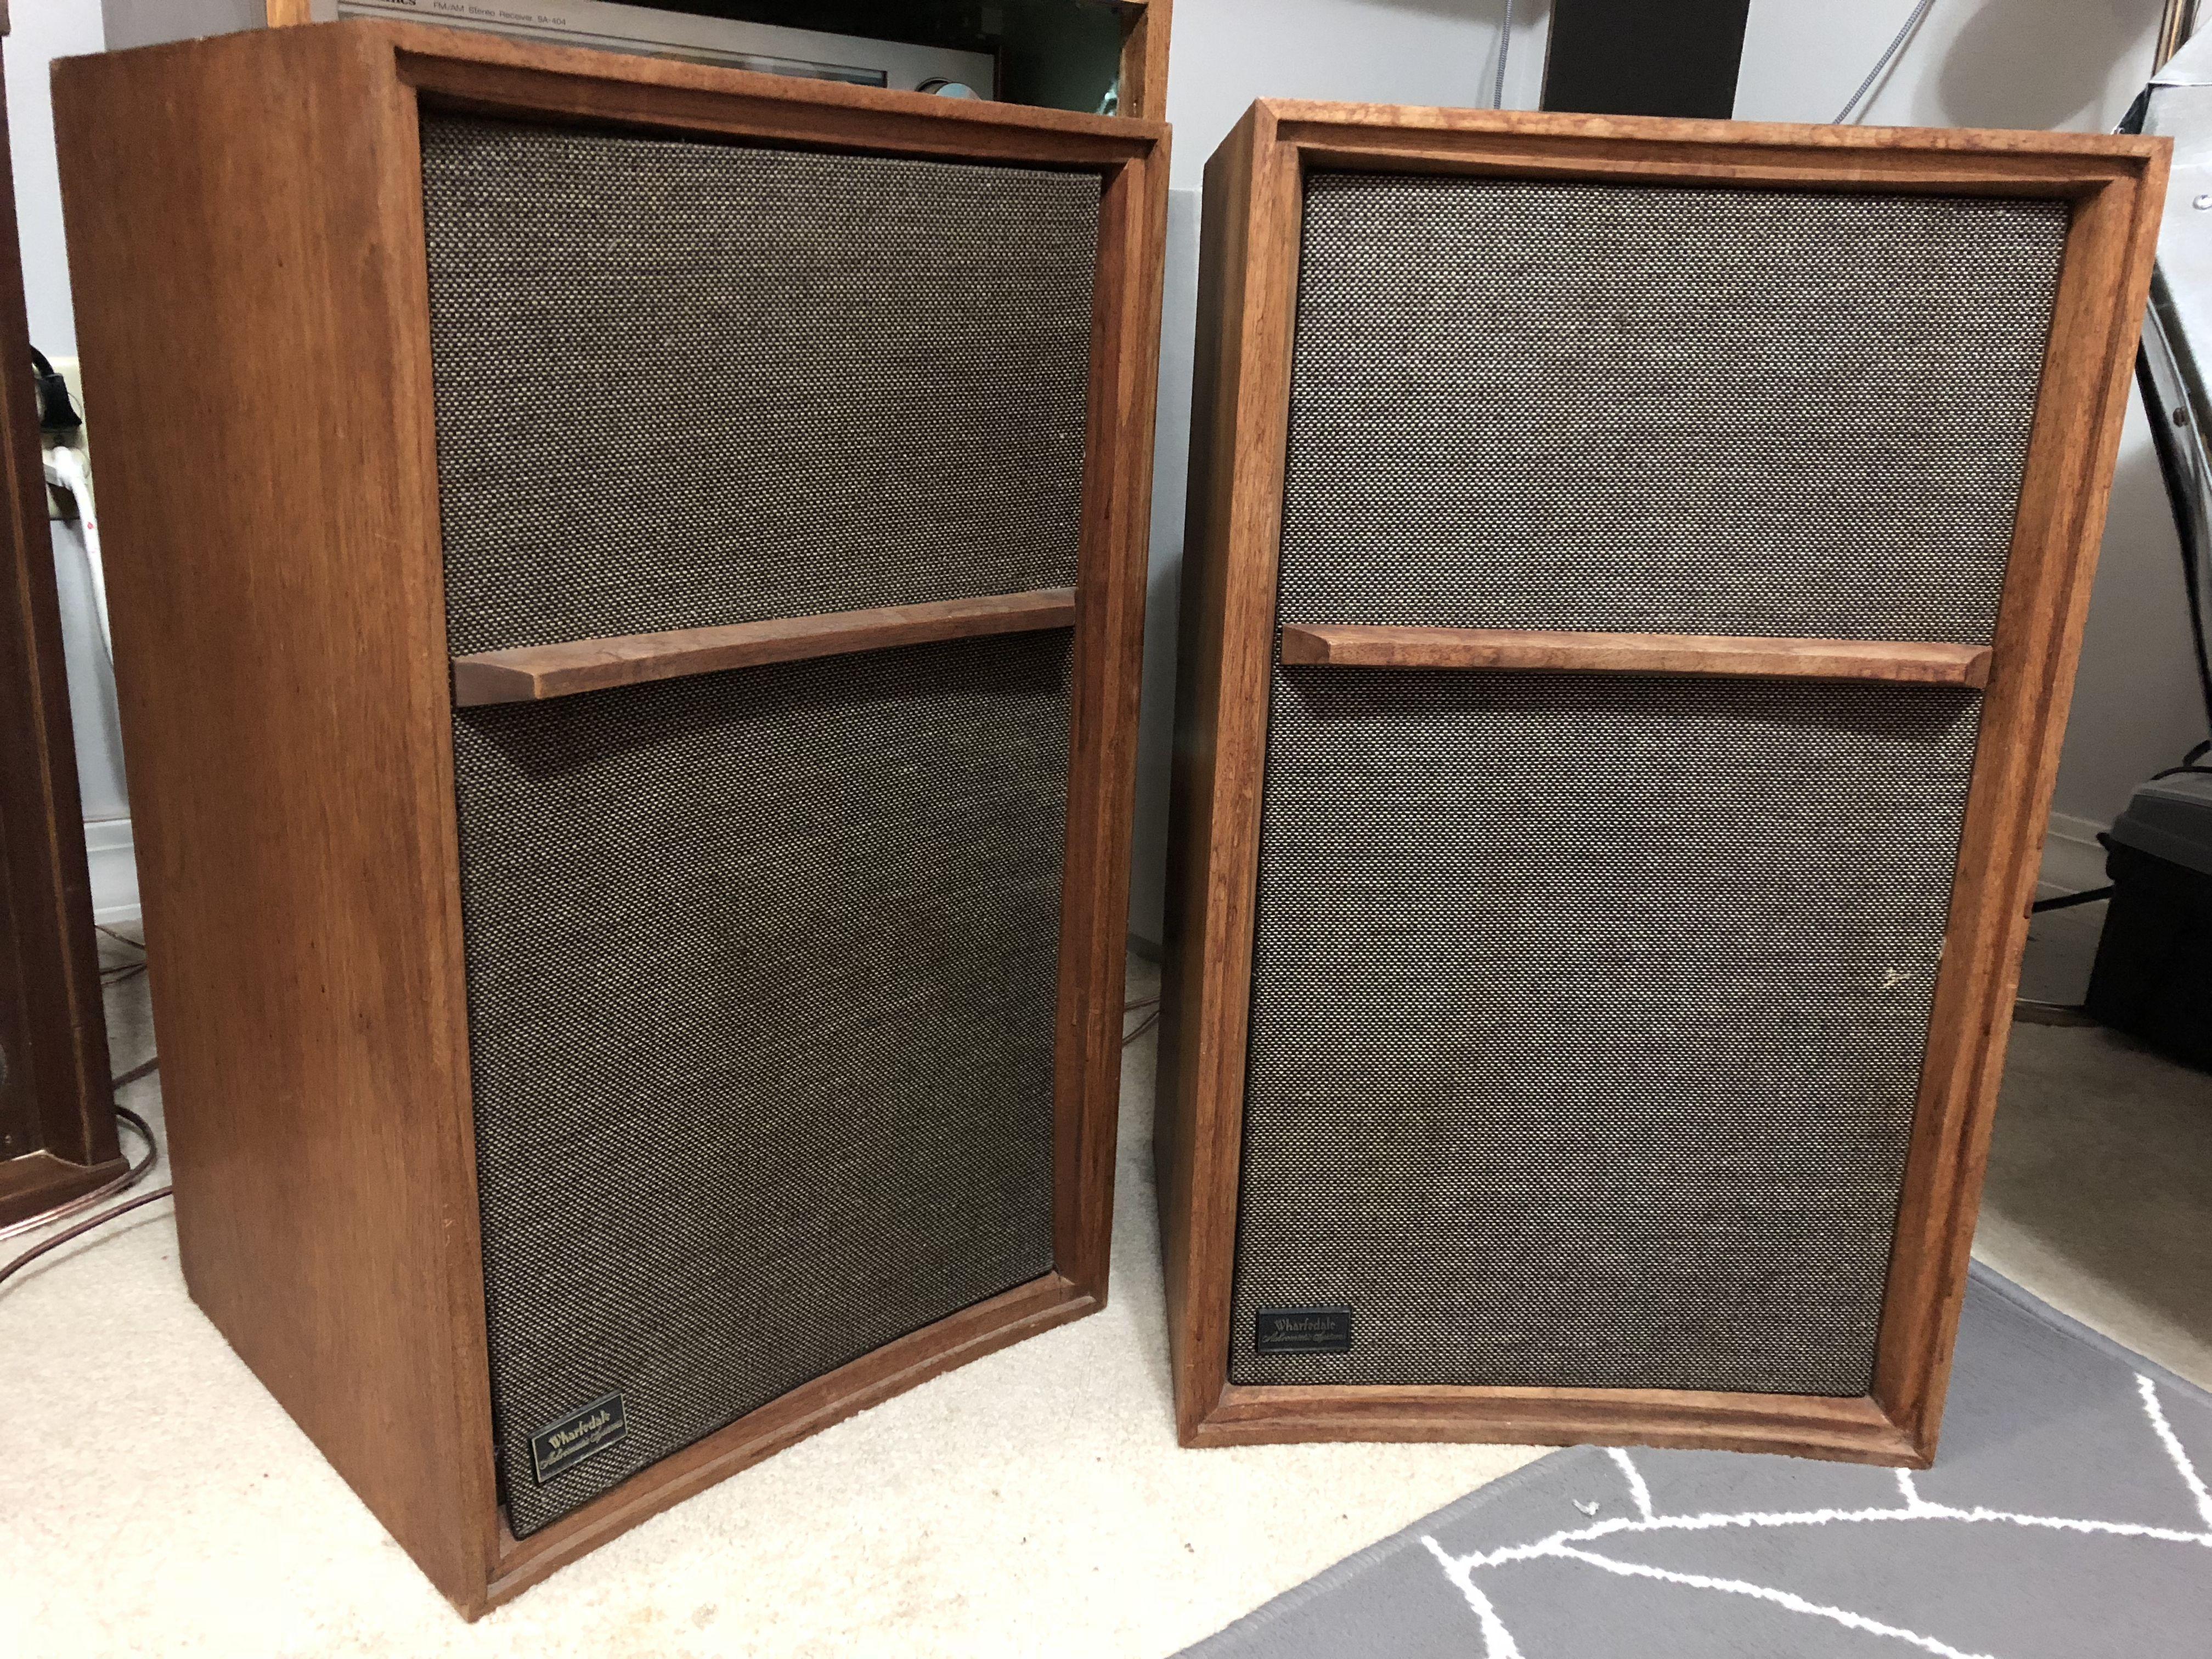 Wharfedale W60d Mark Ii Decor Storage Furniture